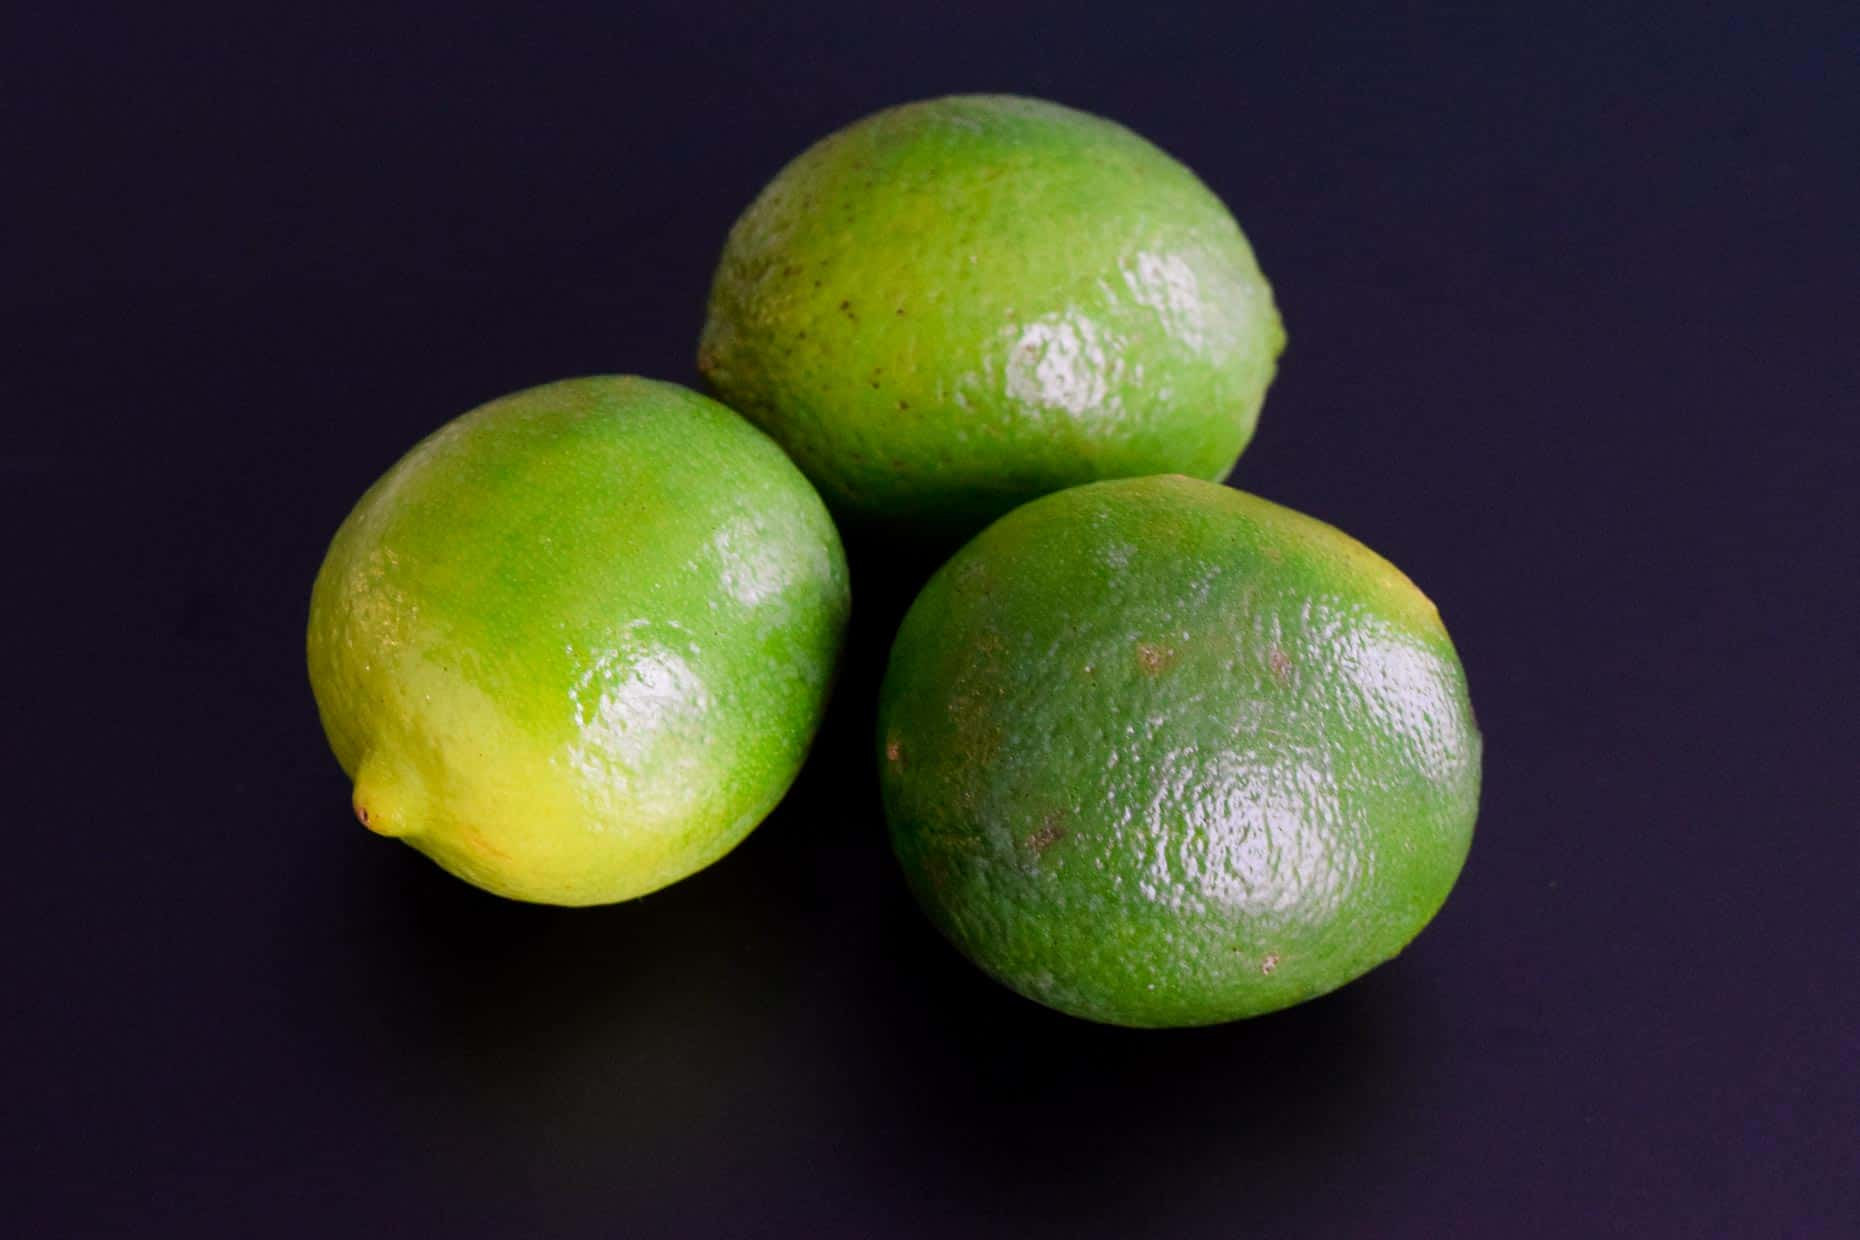 Limes on black background